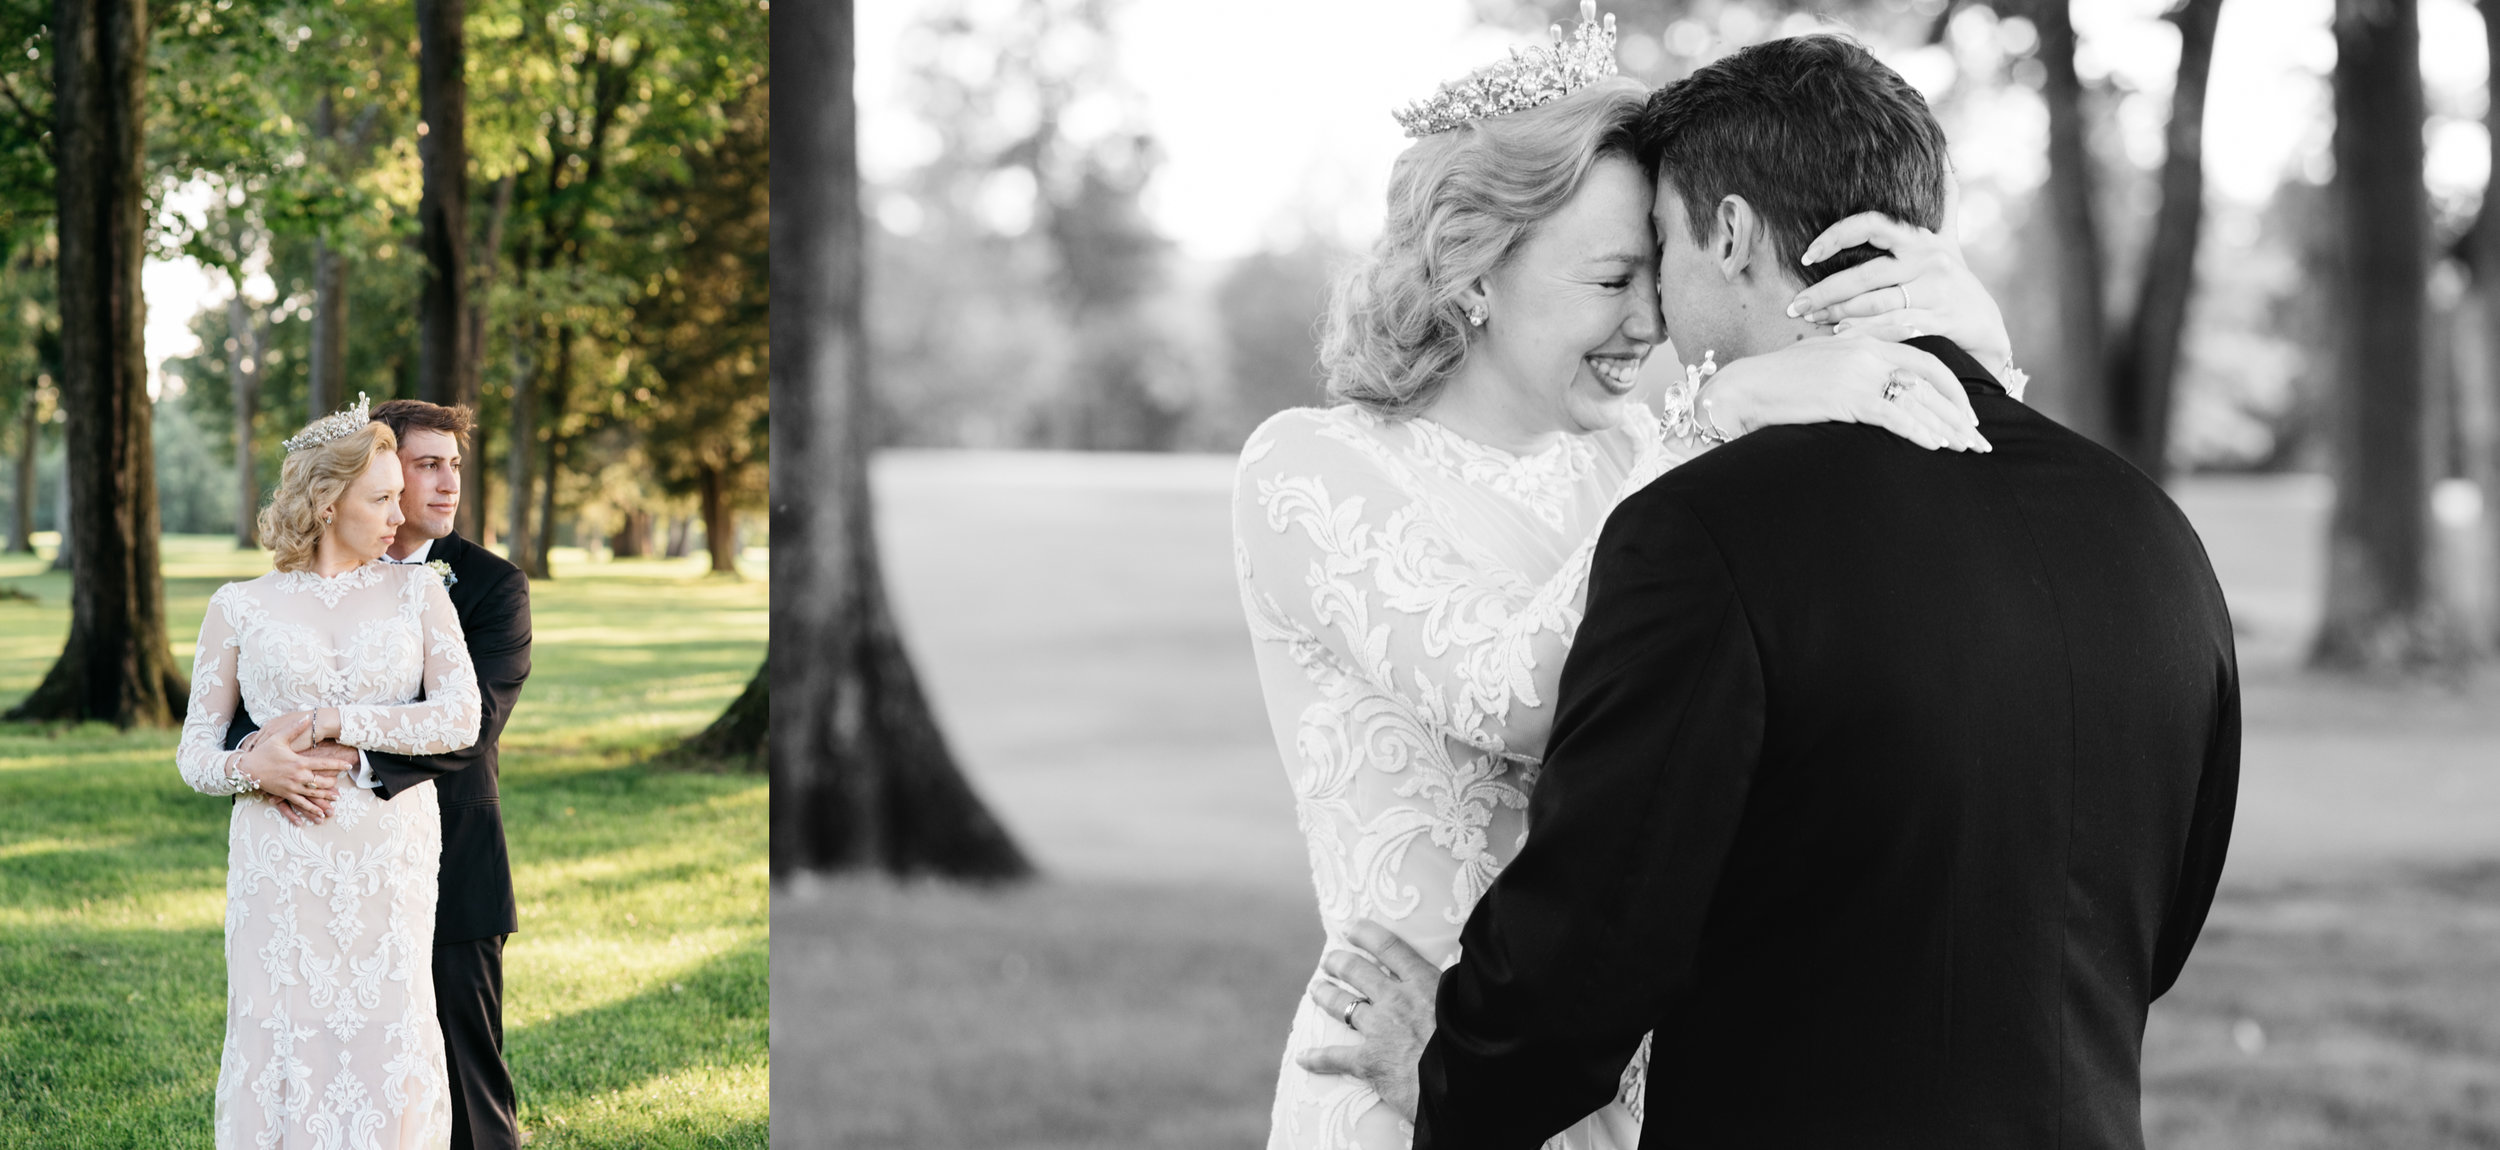 mariah fisher photography ligonier wedding photographer.jpg